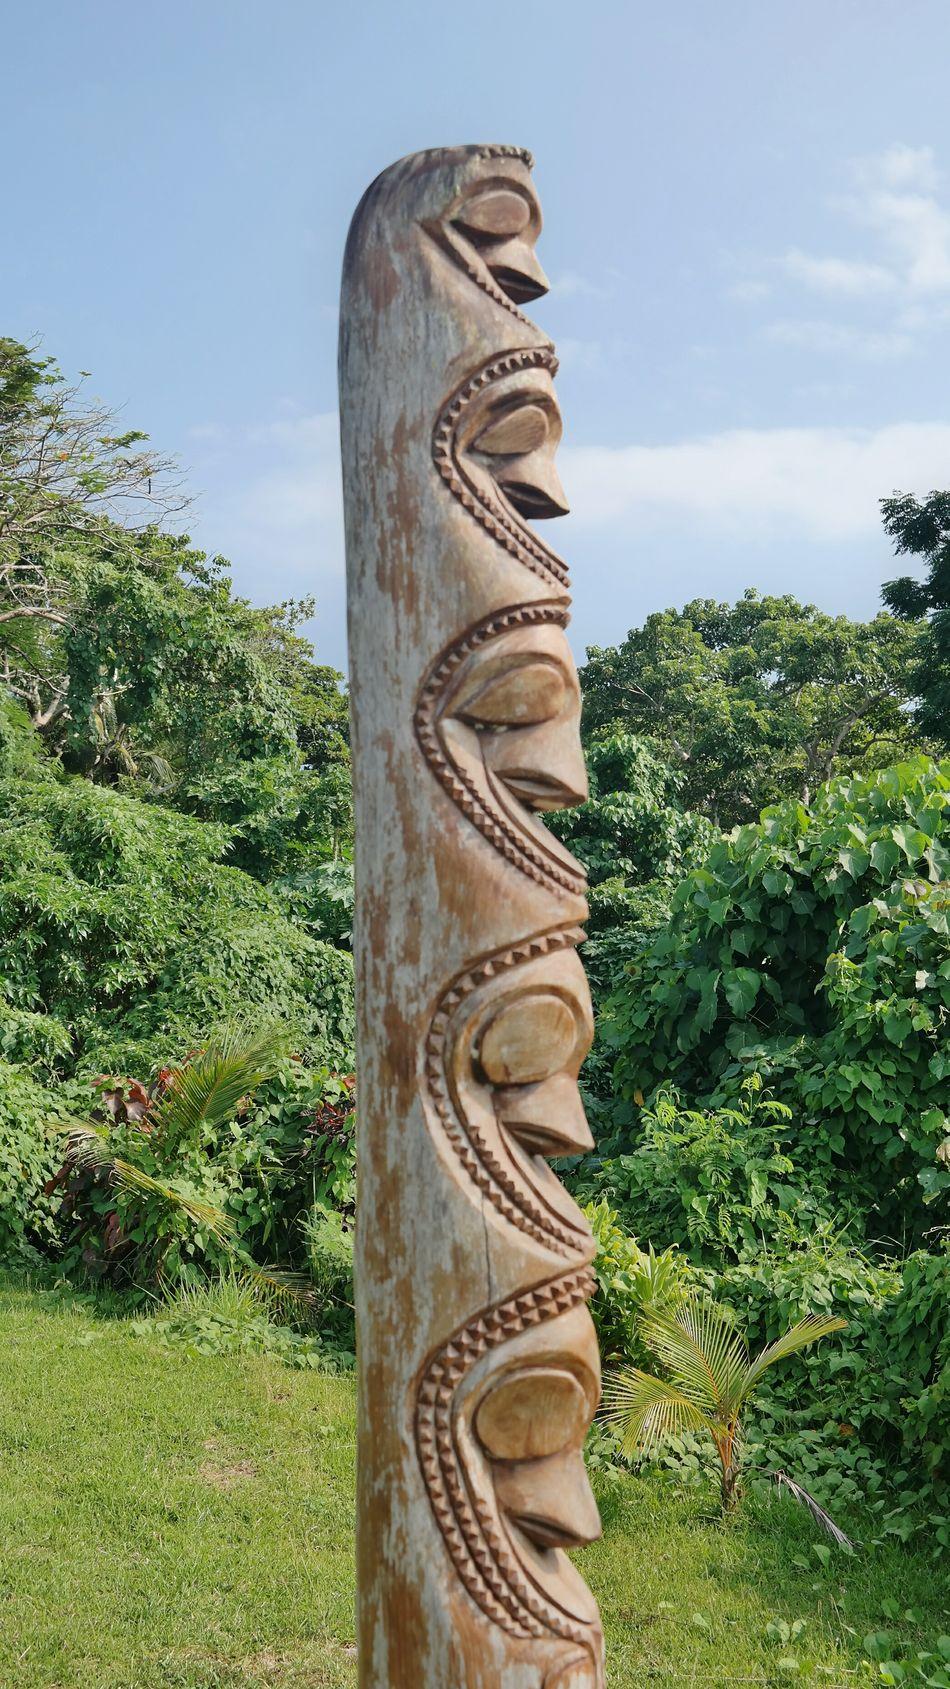 Miles Away Vanuatu Green Color Sky Tree No People Outdoors Sculpture Day Nature Extinct Südsee EyeEm Traveling